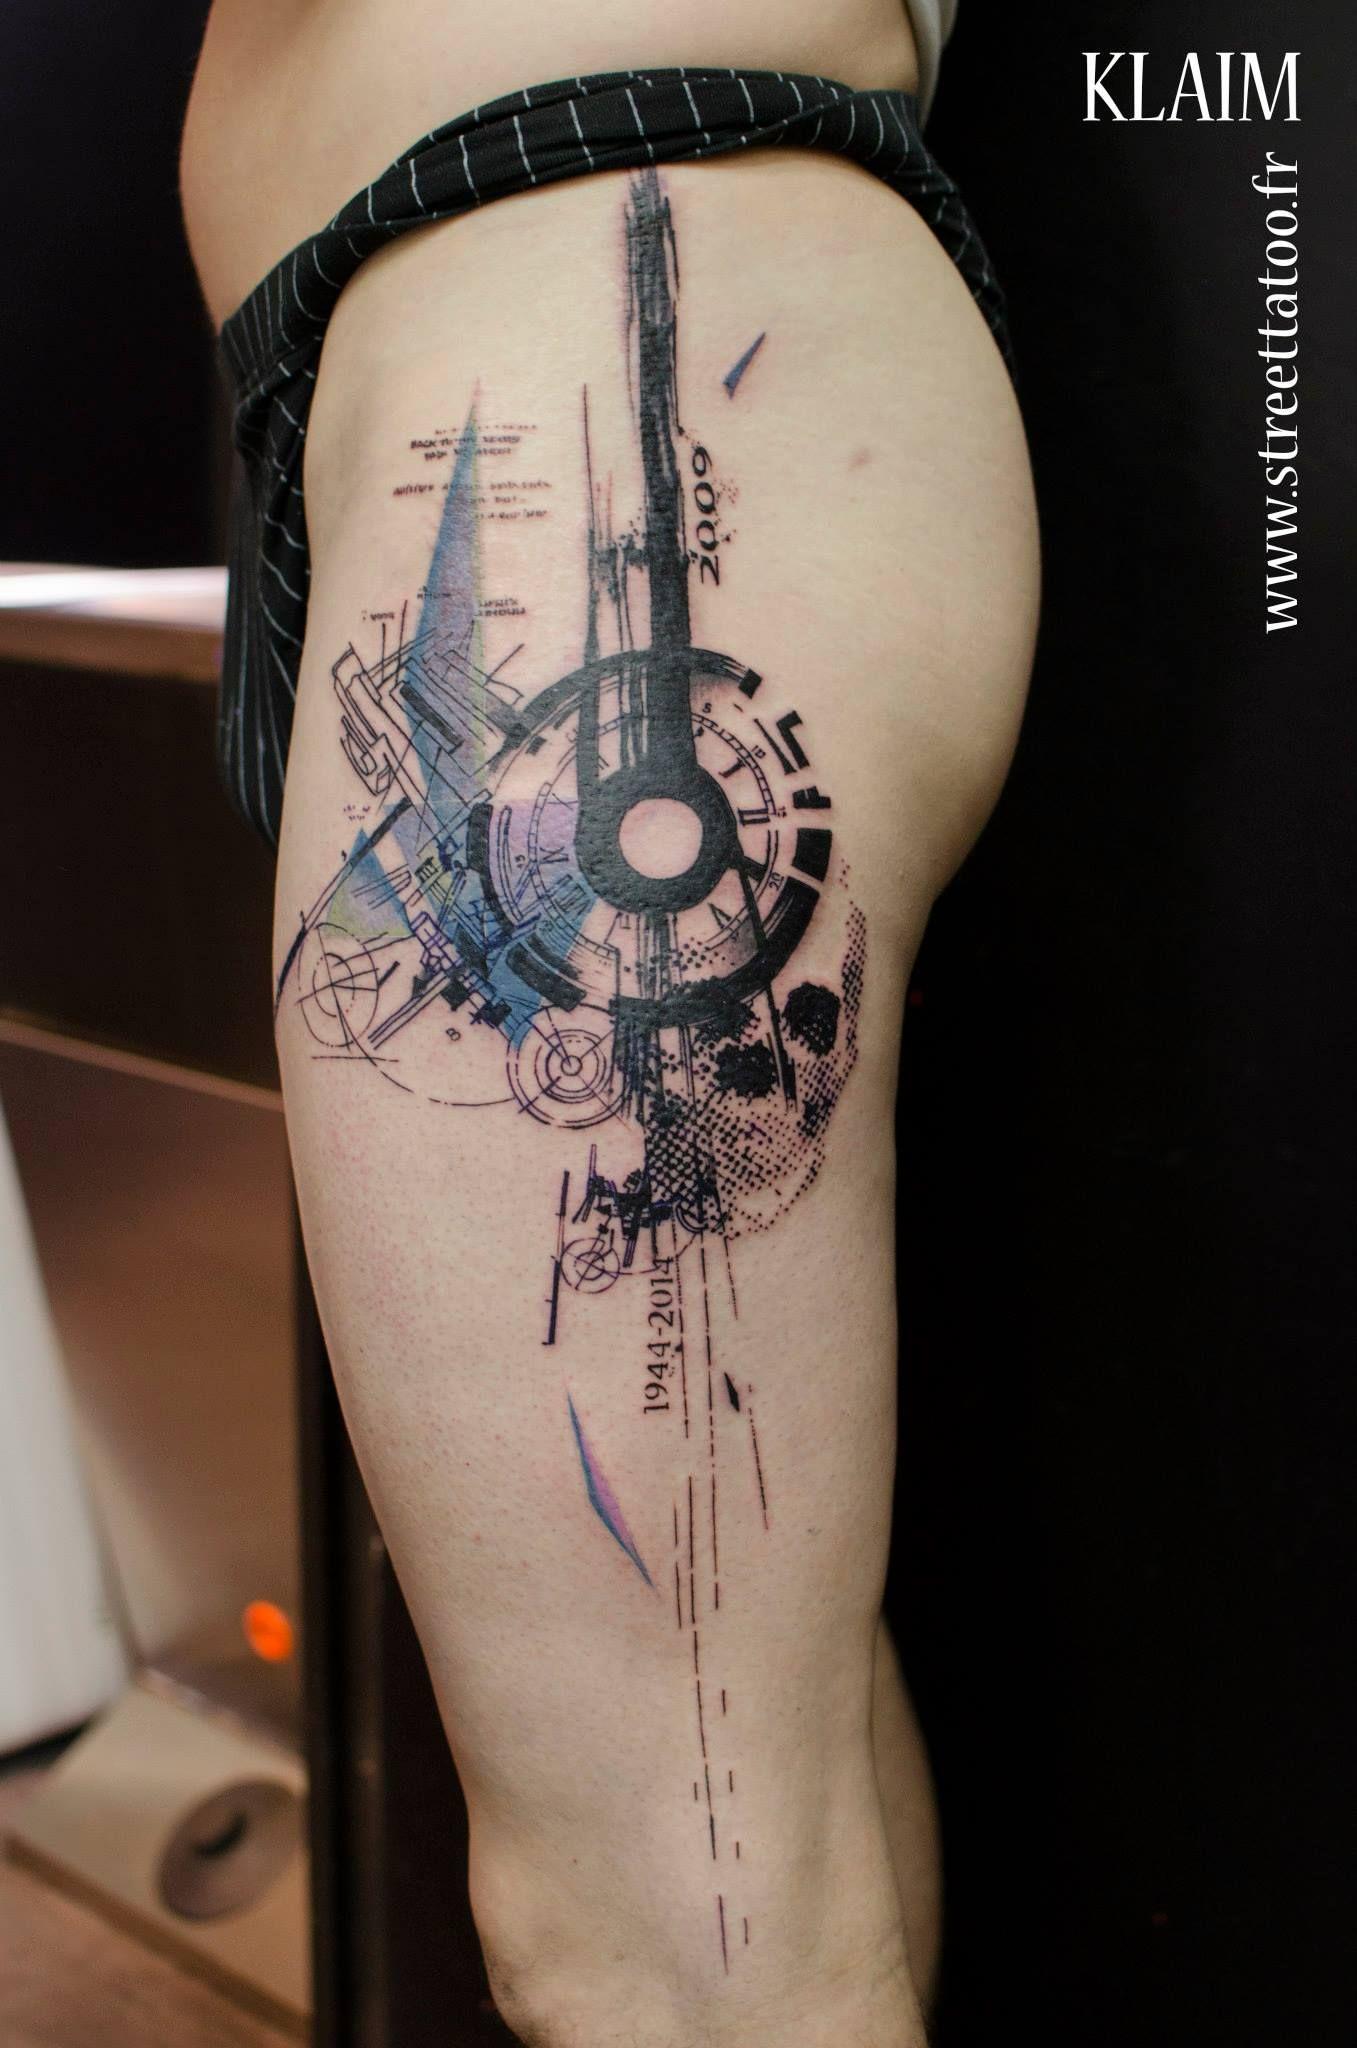 travail sur la texture tattoos klaim tatouage tatouage aquarelle et tatouage g om trique. Black Bedroom Furniture Sets. Home Design Ideas